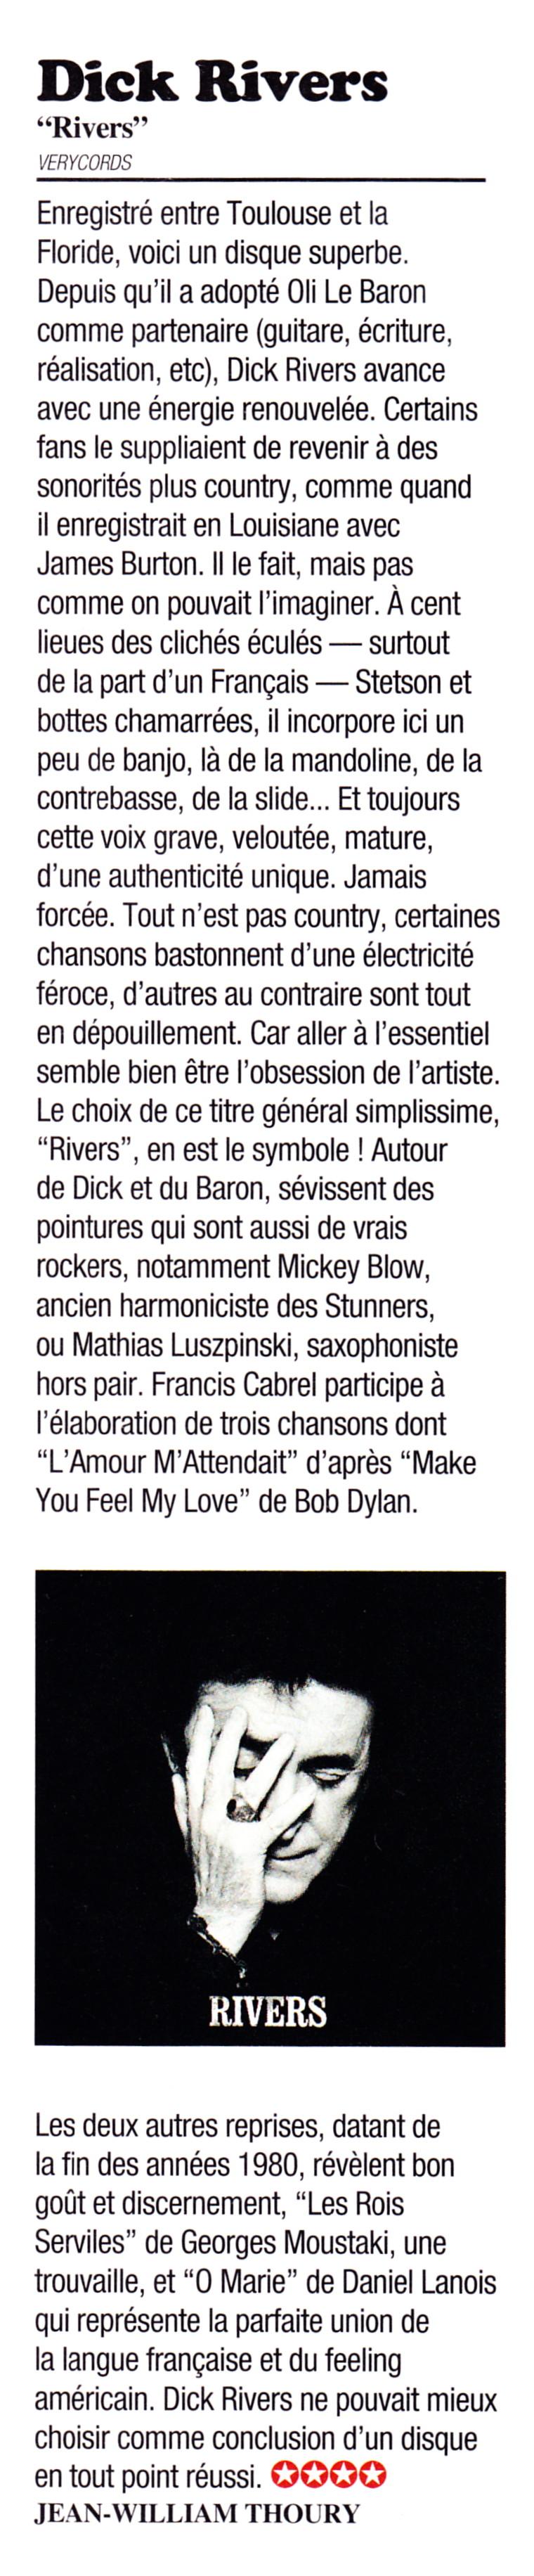 "DICK RIVERS ""Mister D Tour"" 2011/2013 : compte rendu (Casino de Paris, Olympia, Noisy, Clamart) 14070612154316724012368180"